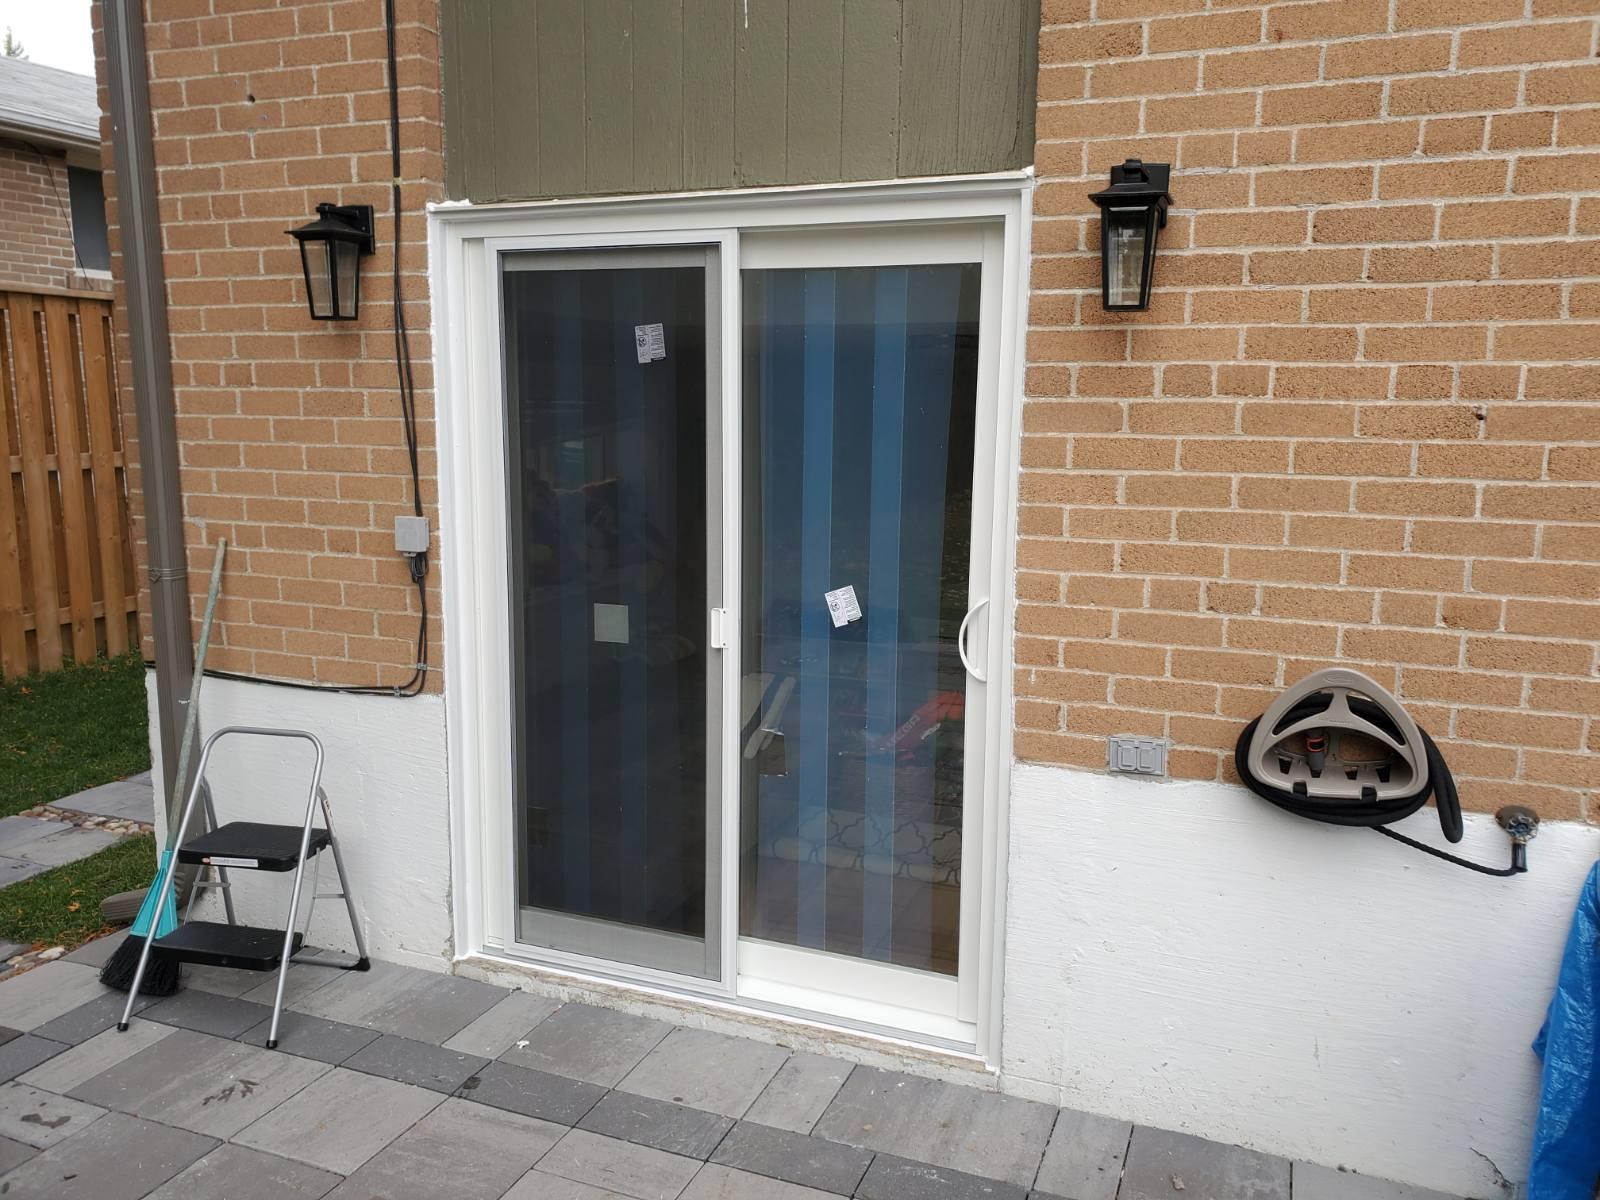 PVC Sliding Door Installation and Replacement, PVC Windows Woodbridge, Maple, Vaughan, King, Aurora, Nemwarket, Caledon, Nobleton, Kleinburg